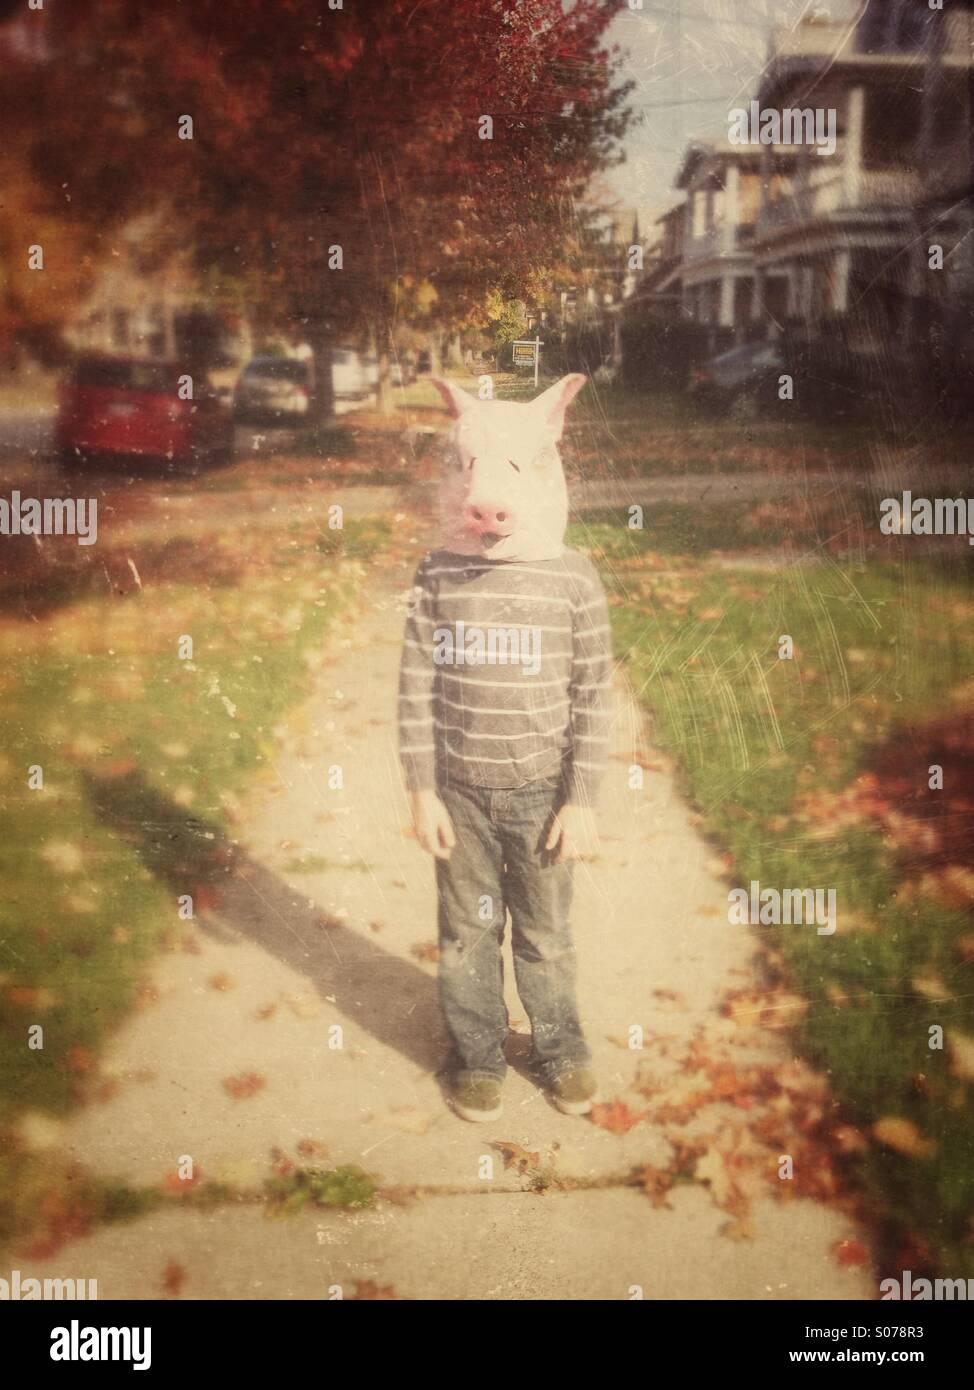 Boy in pig mask on sidewalk Photo Stock